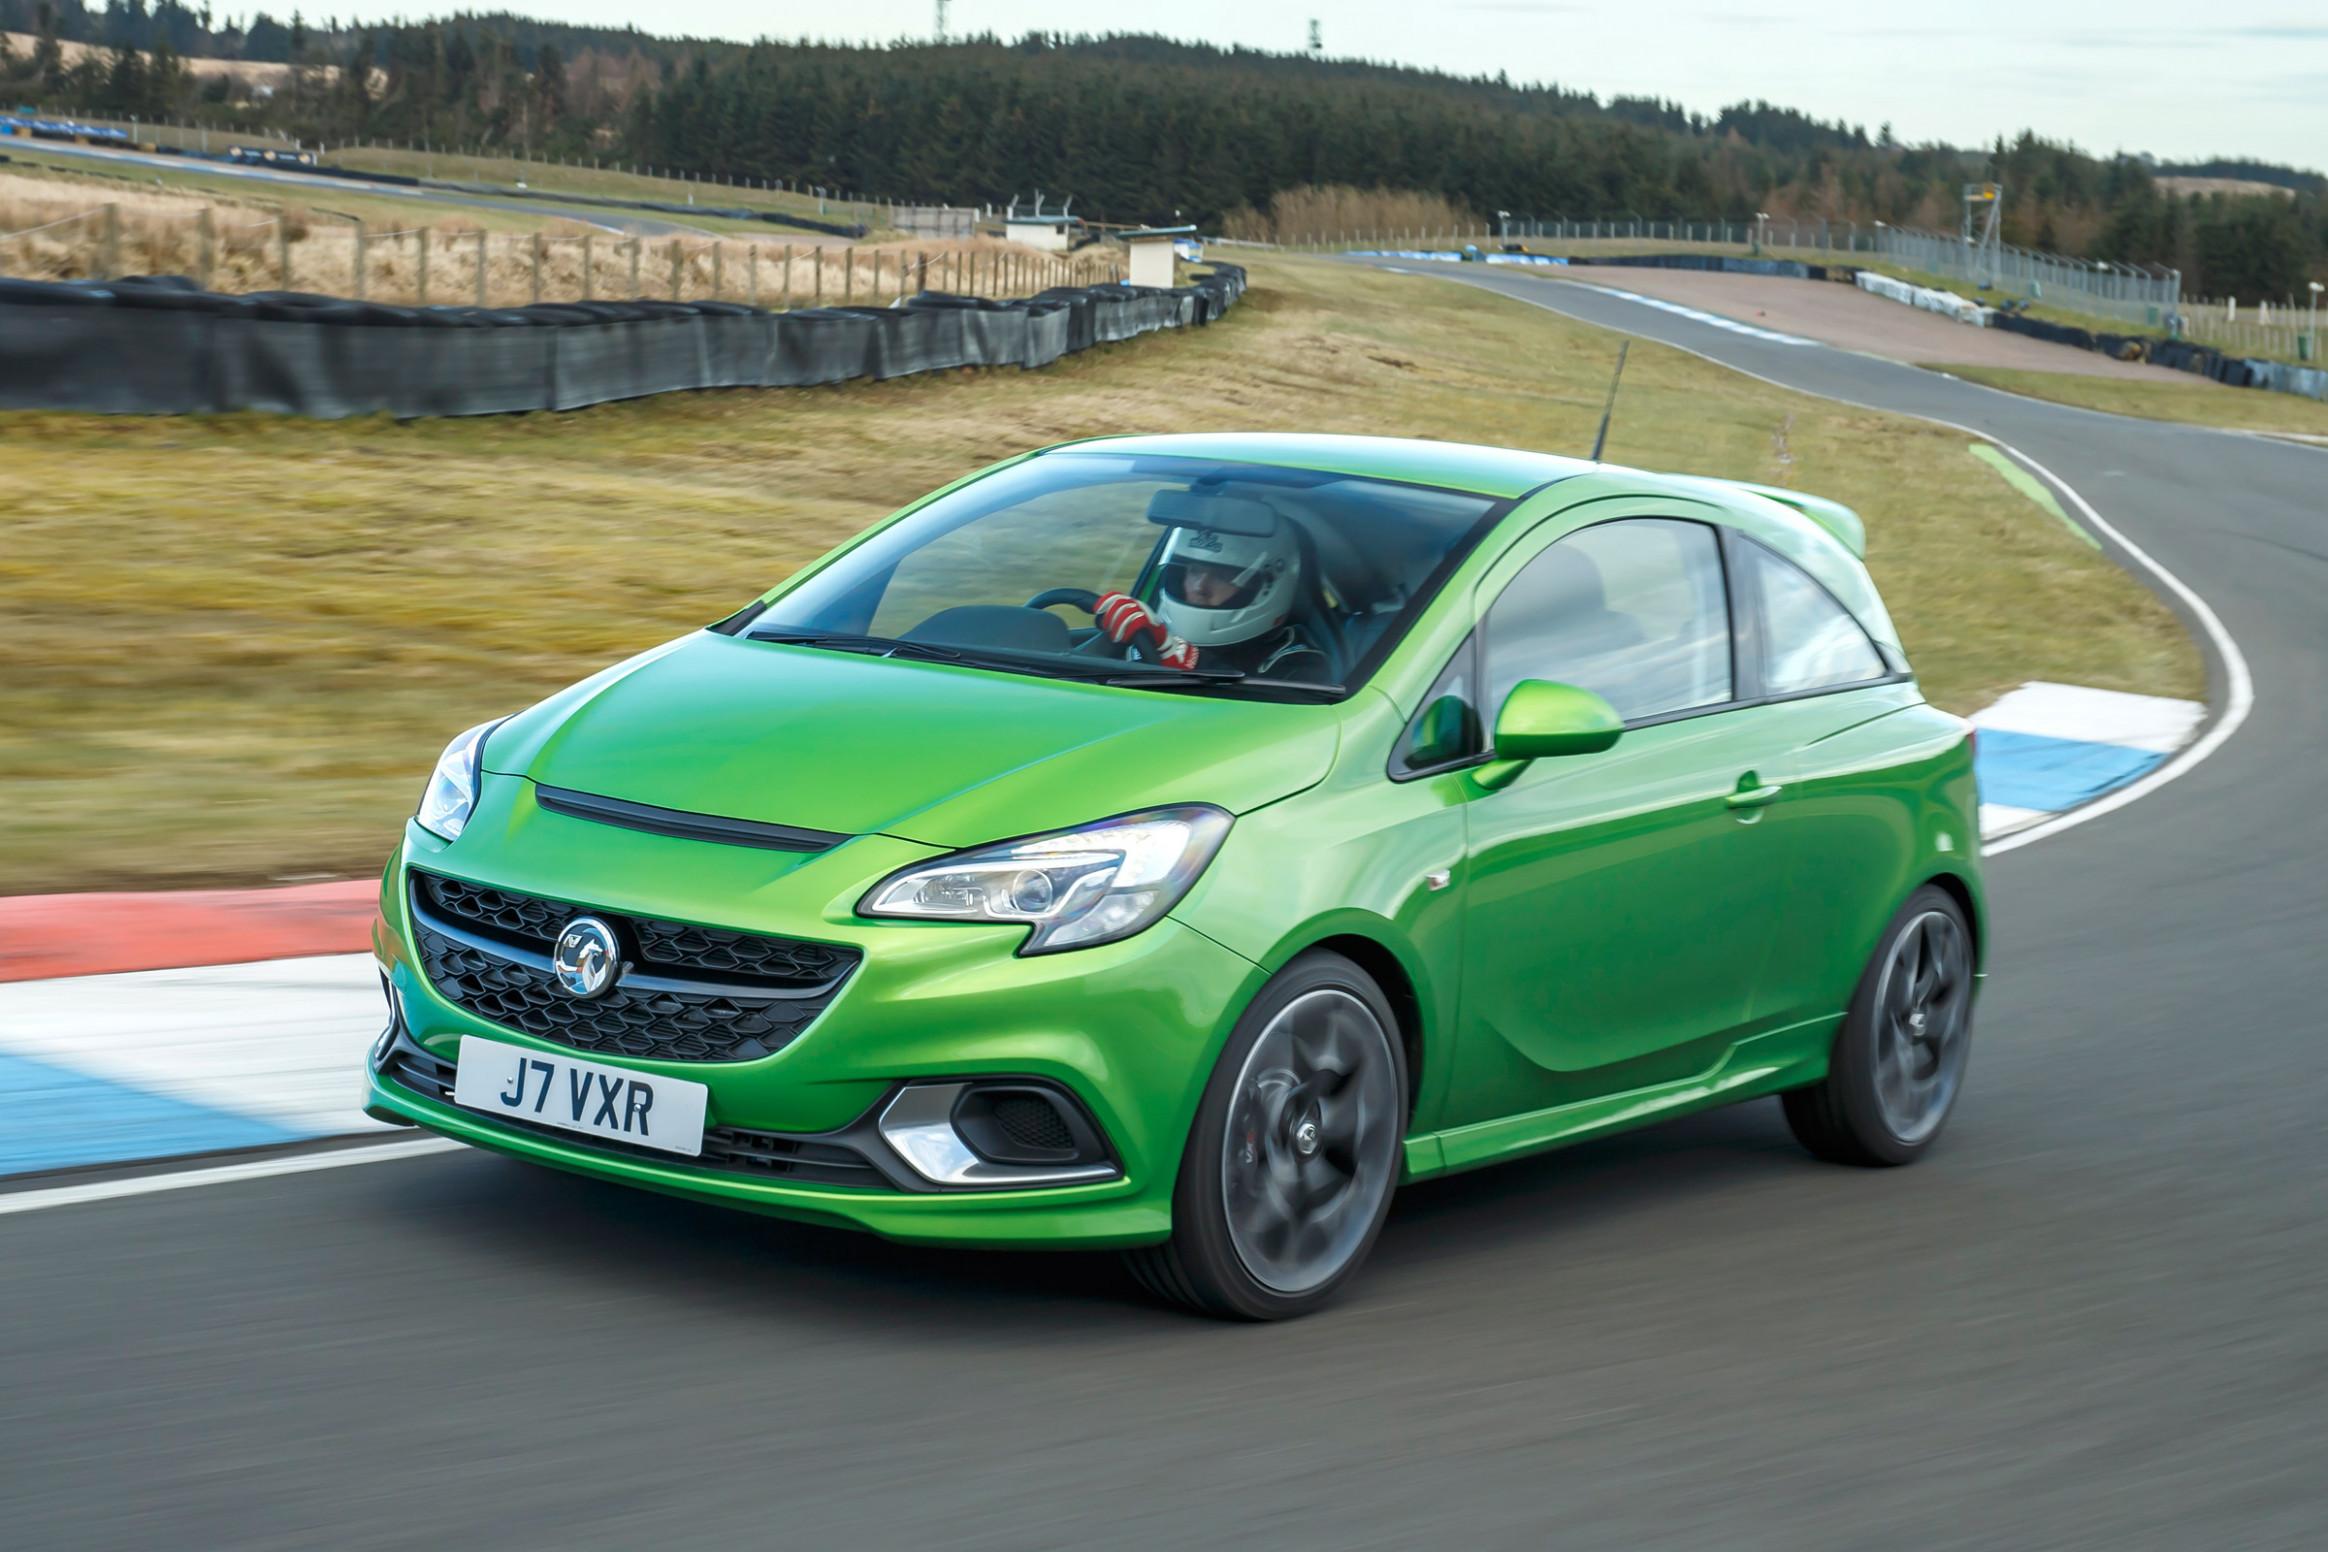 Reviews 2022 Vauxhall Corsa VXR